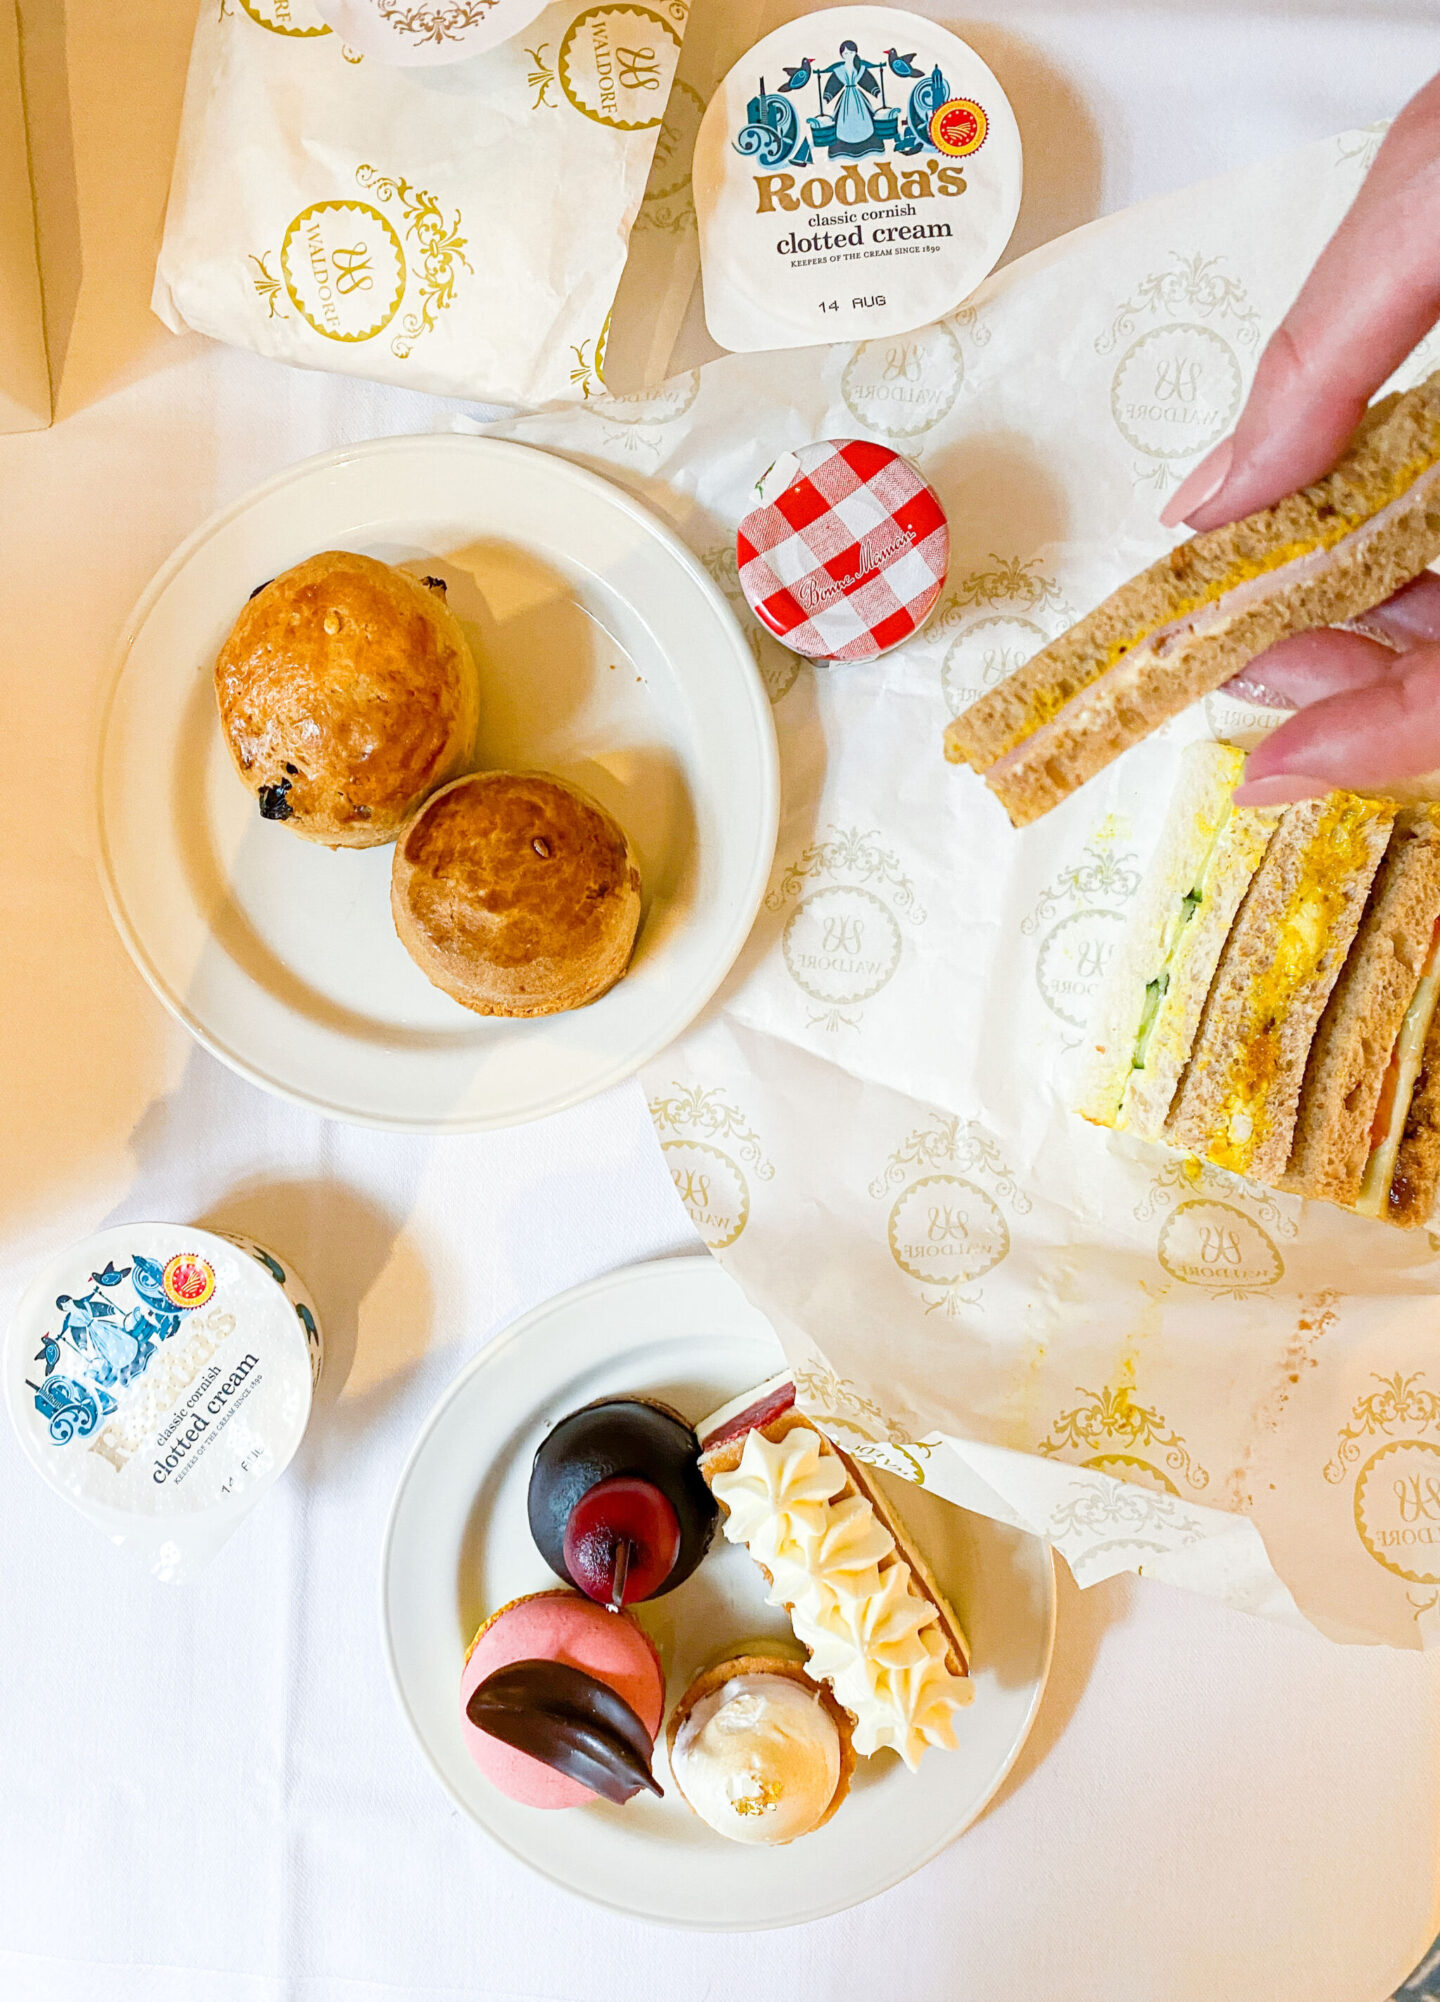 Afternoon tea at Waldorf Hilton